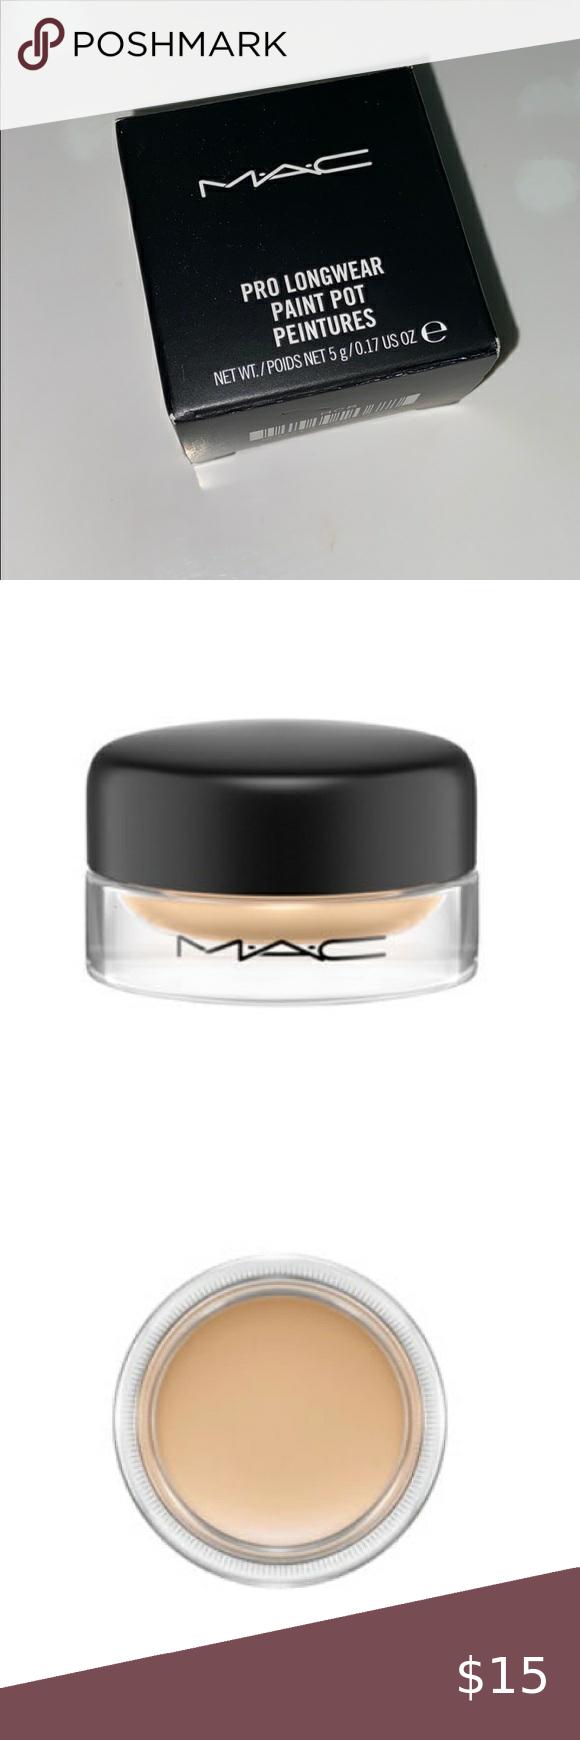 MAC Pro Longwear Paint Pot in 2020 Painted pots, Makeup